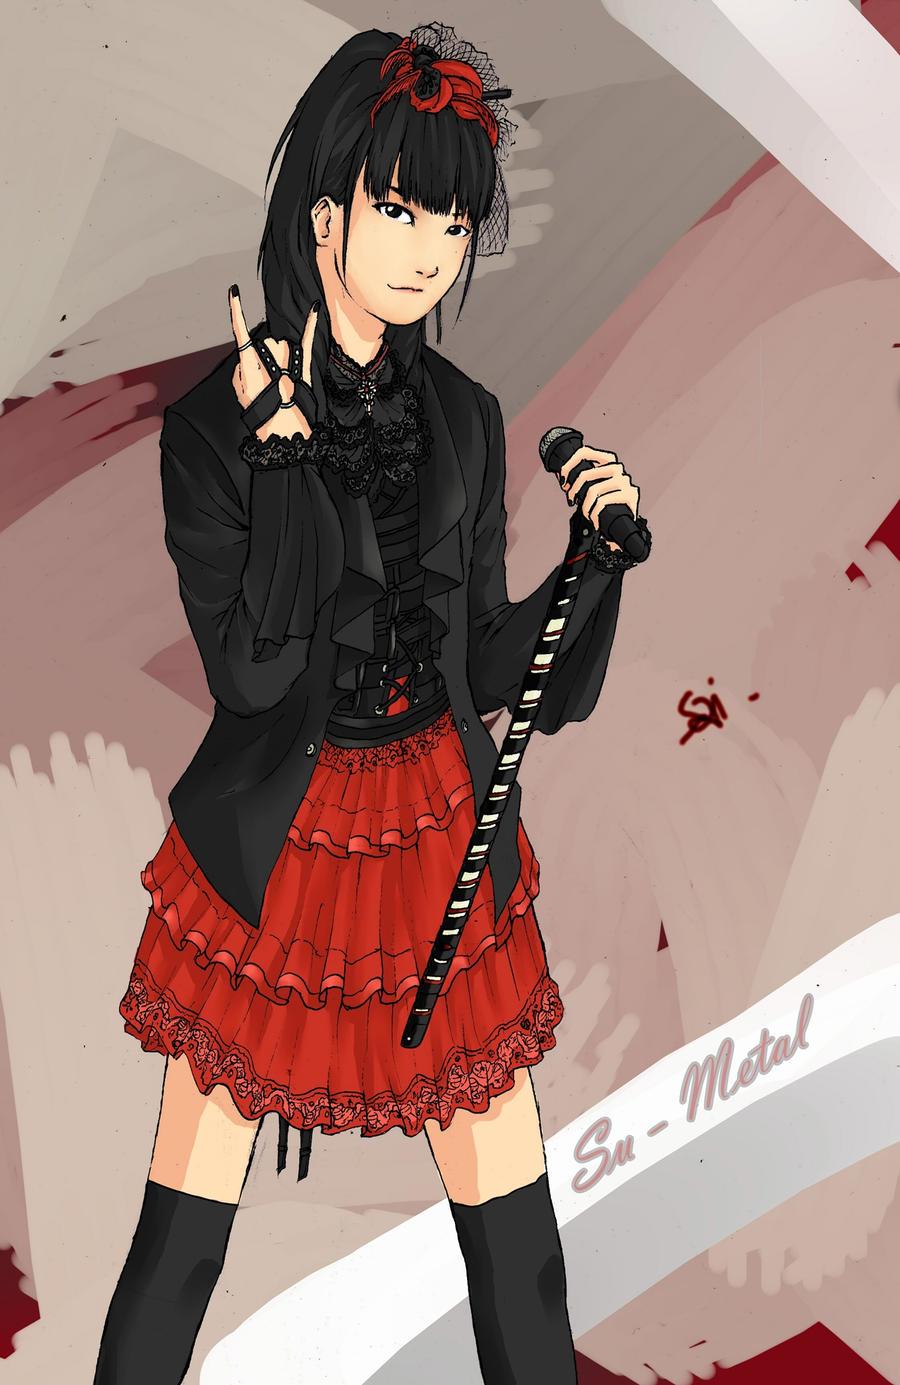 Suzuka Nakamoto (Fan art) by Arrasyart